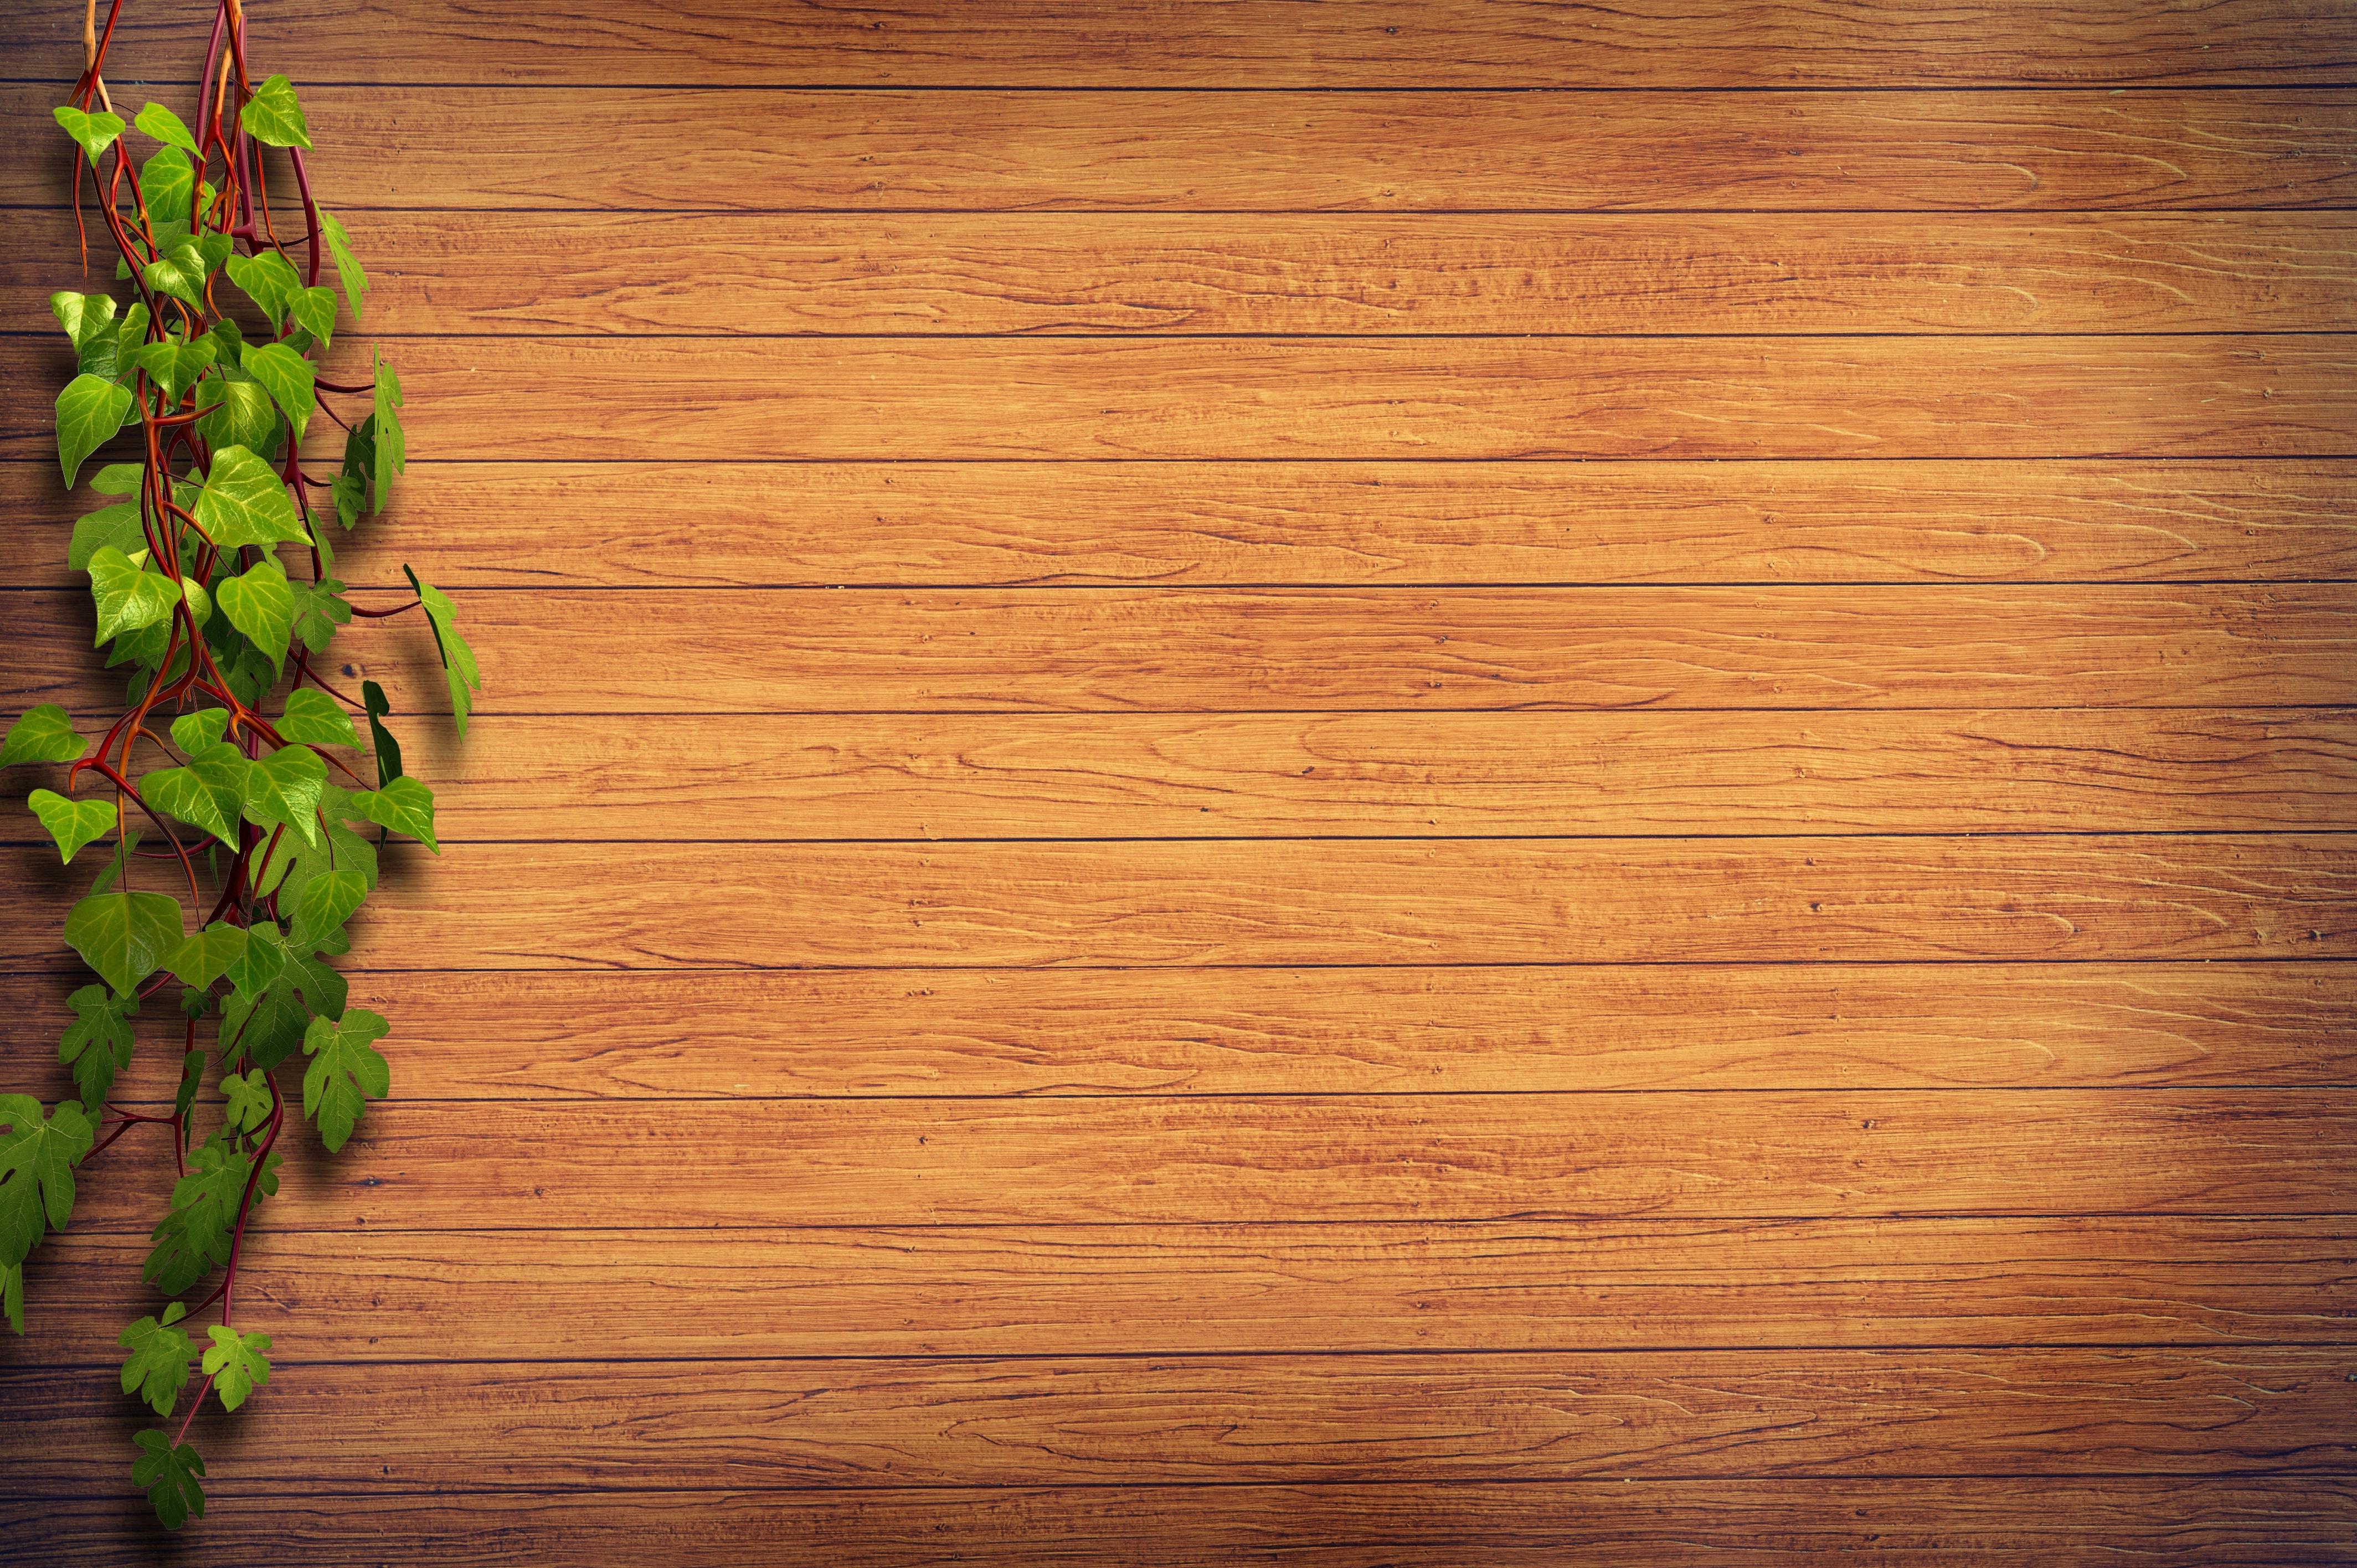 1000+ Engaging Wooden Wall Photos · Pexels · Free Stock Photos